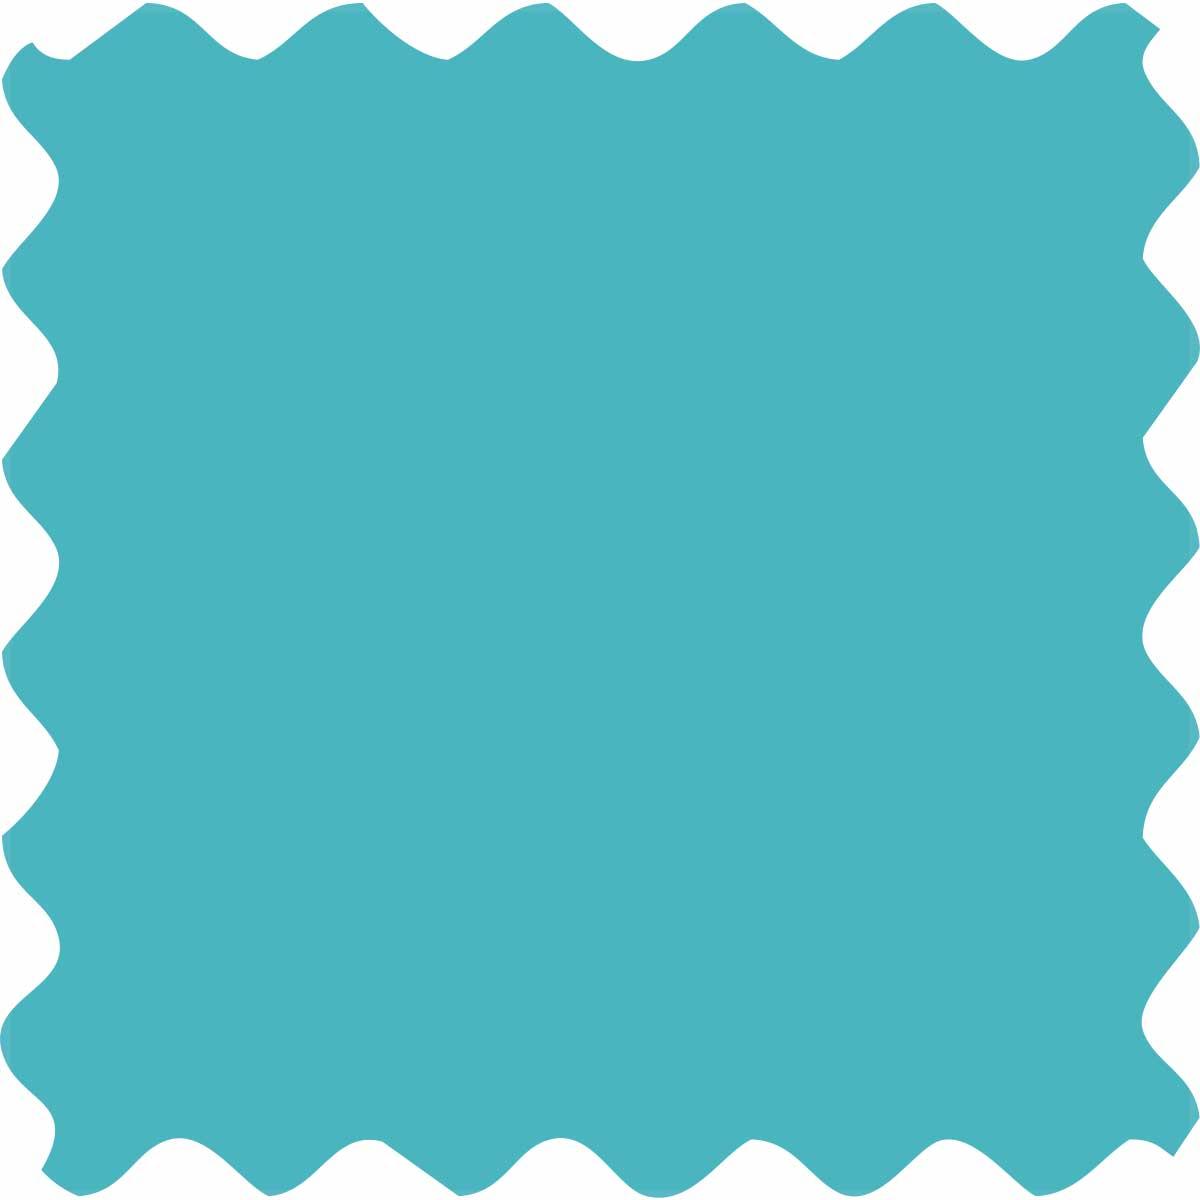 Fabric Creations™ Plush™ 3-D Fabric Paints - Blue Slushie, 2 oz. - 26335